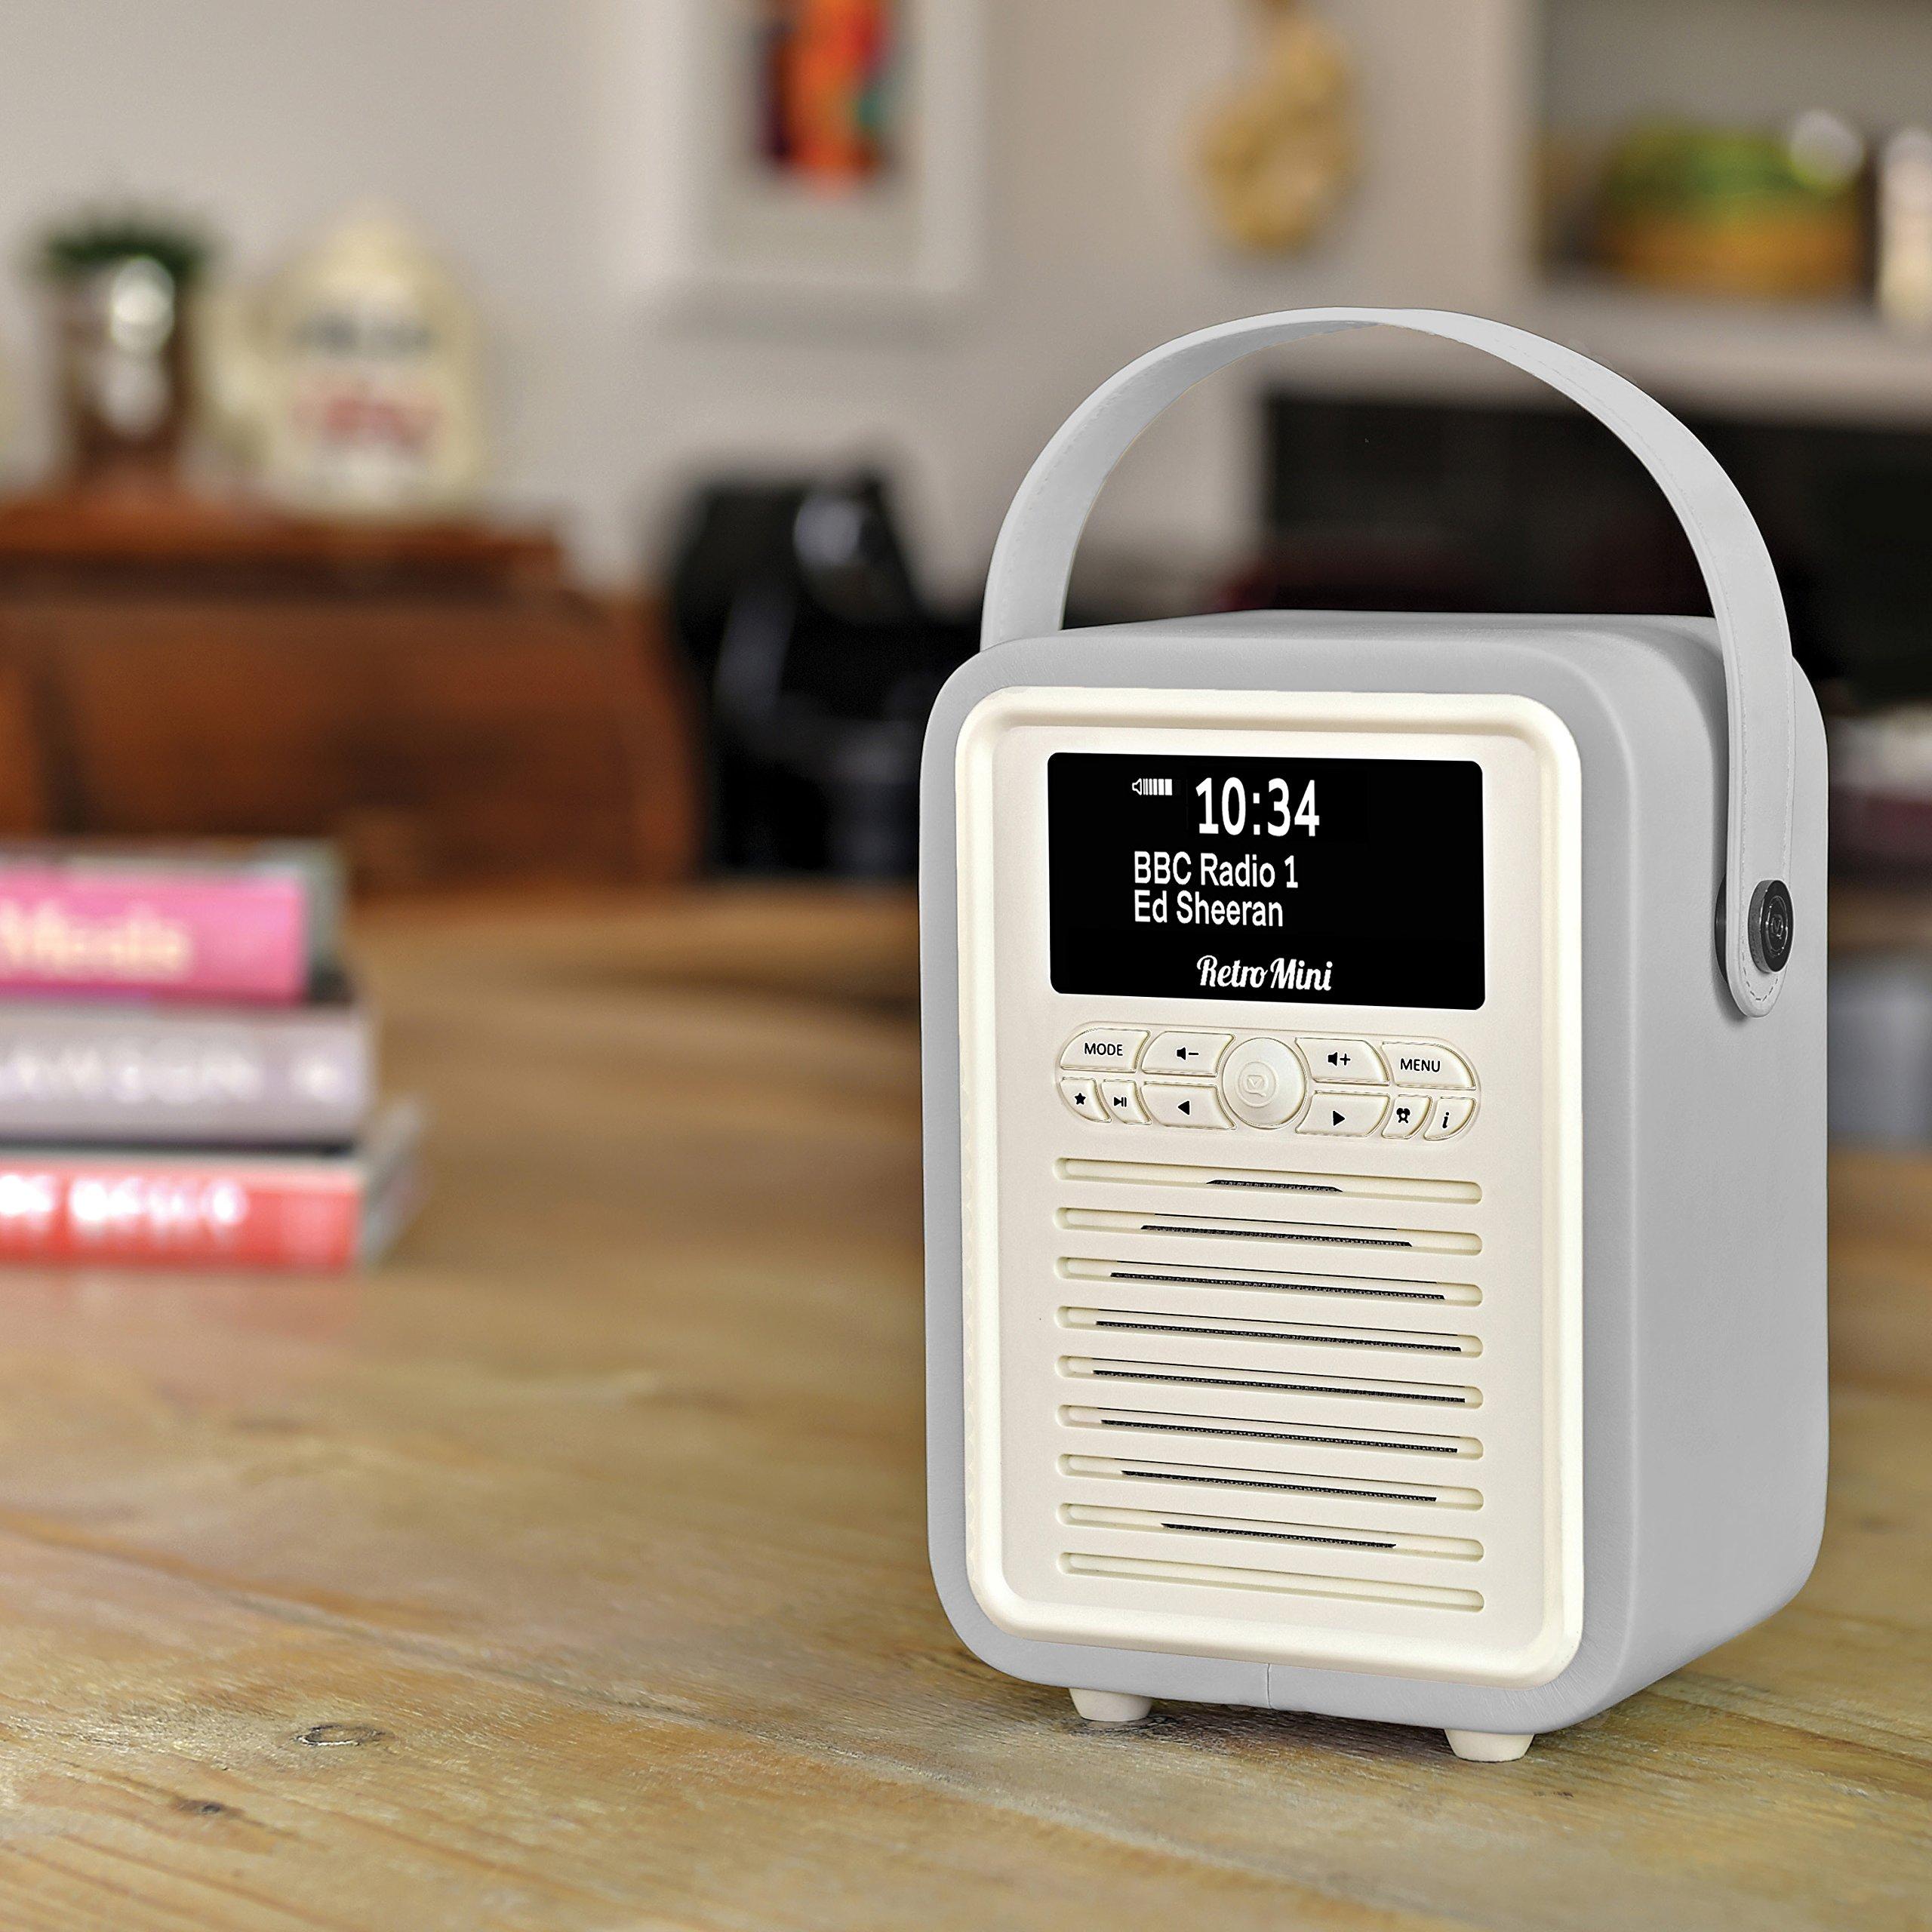 Retro Mini by VQ   Radio & Bluetooth Speaker with AM/FM & HD Radio, Dual Alarm Clock Mains or Battery – Premium PU Leather Case Light Grey by VQ (Image #2)